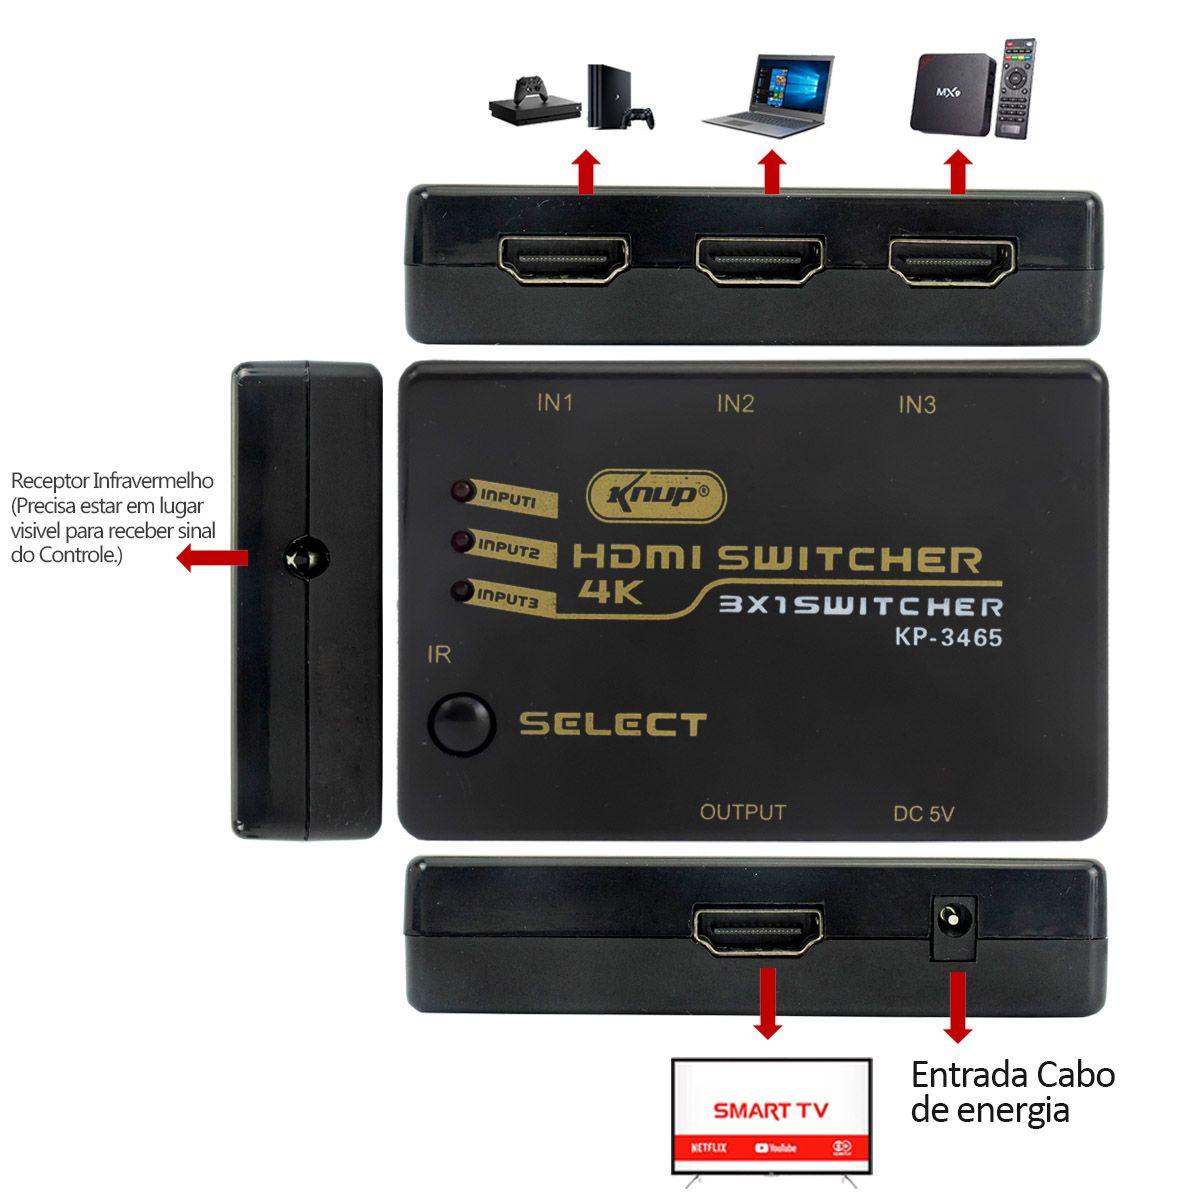 Switch HDMI 4k 3x1 com Controle Knup KP-3465 + Cabo Usb DC + 2 Cabos hdmi de 1,5 Metro